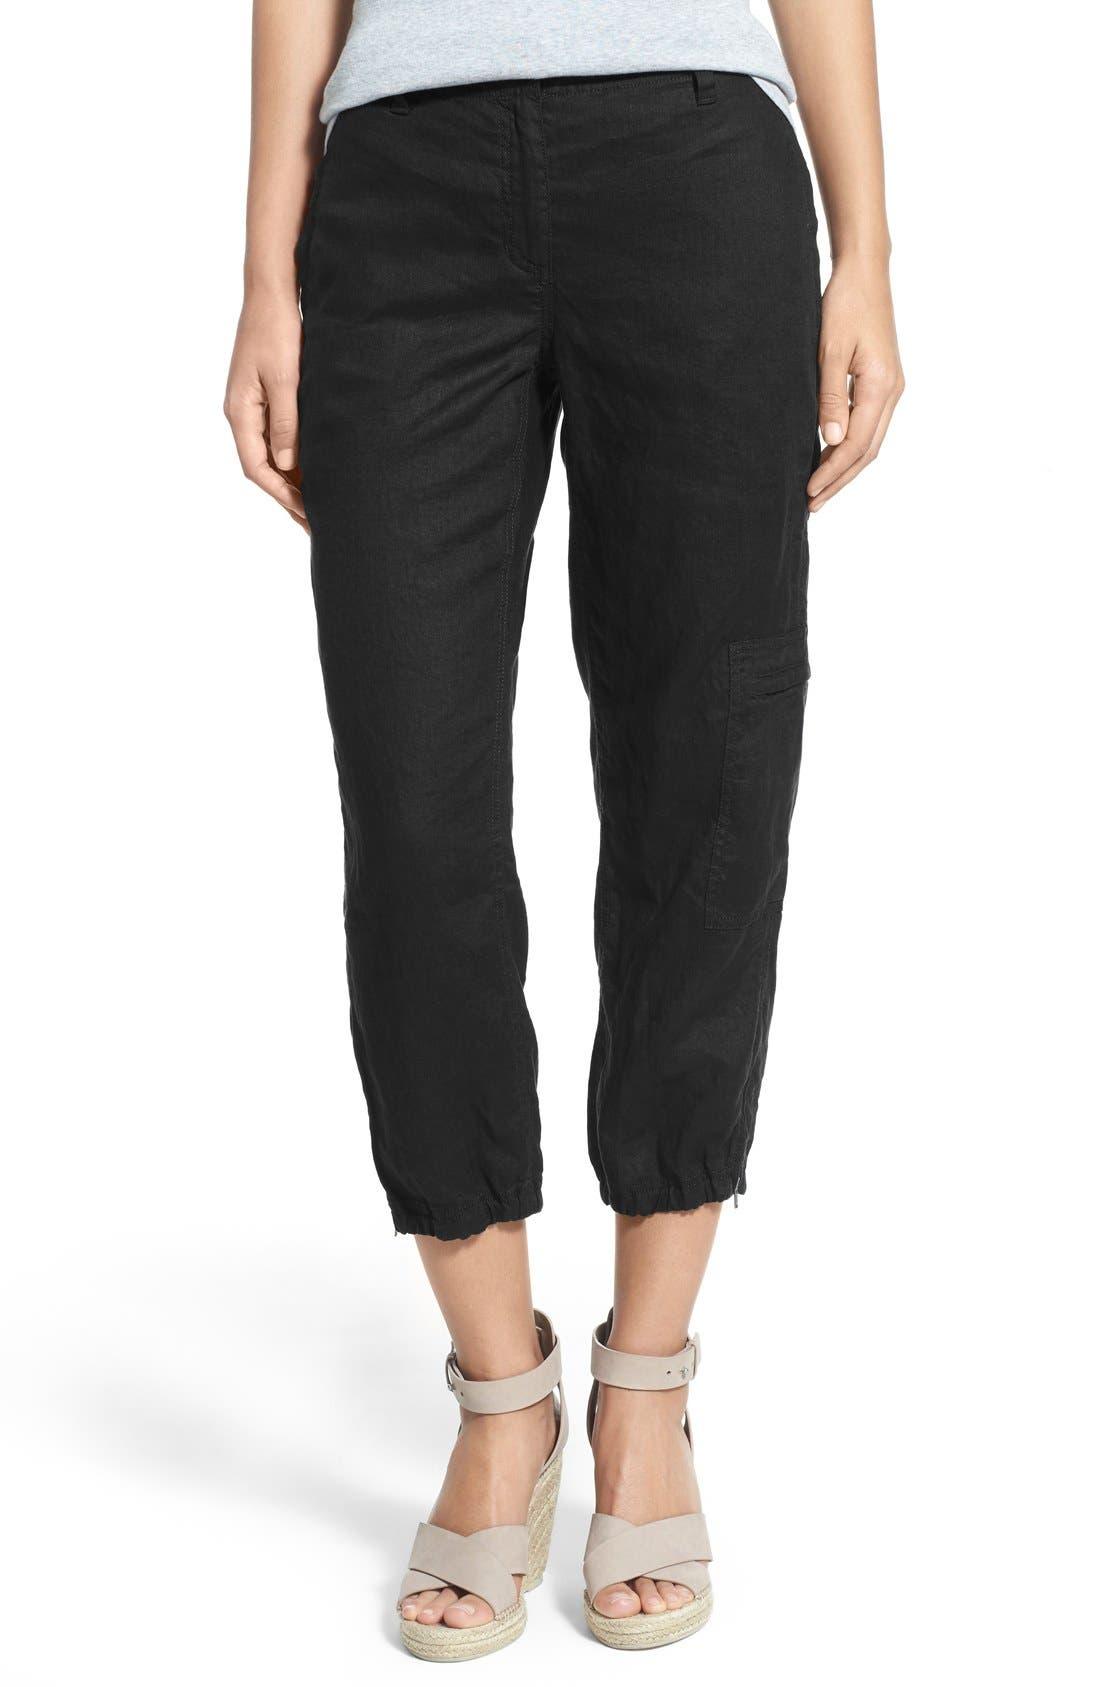 Organic Linen Cargo Ankle Pants,                             Main thumbnail 1, color,                             001